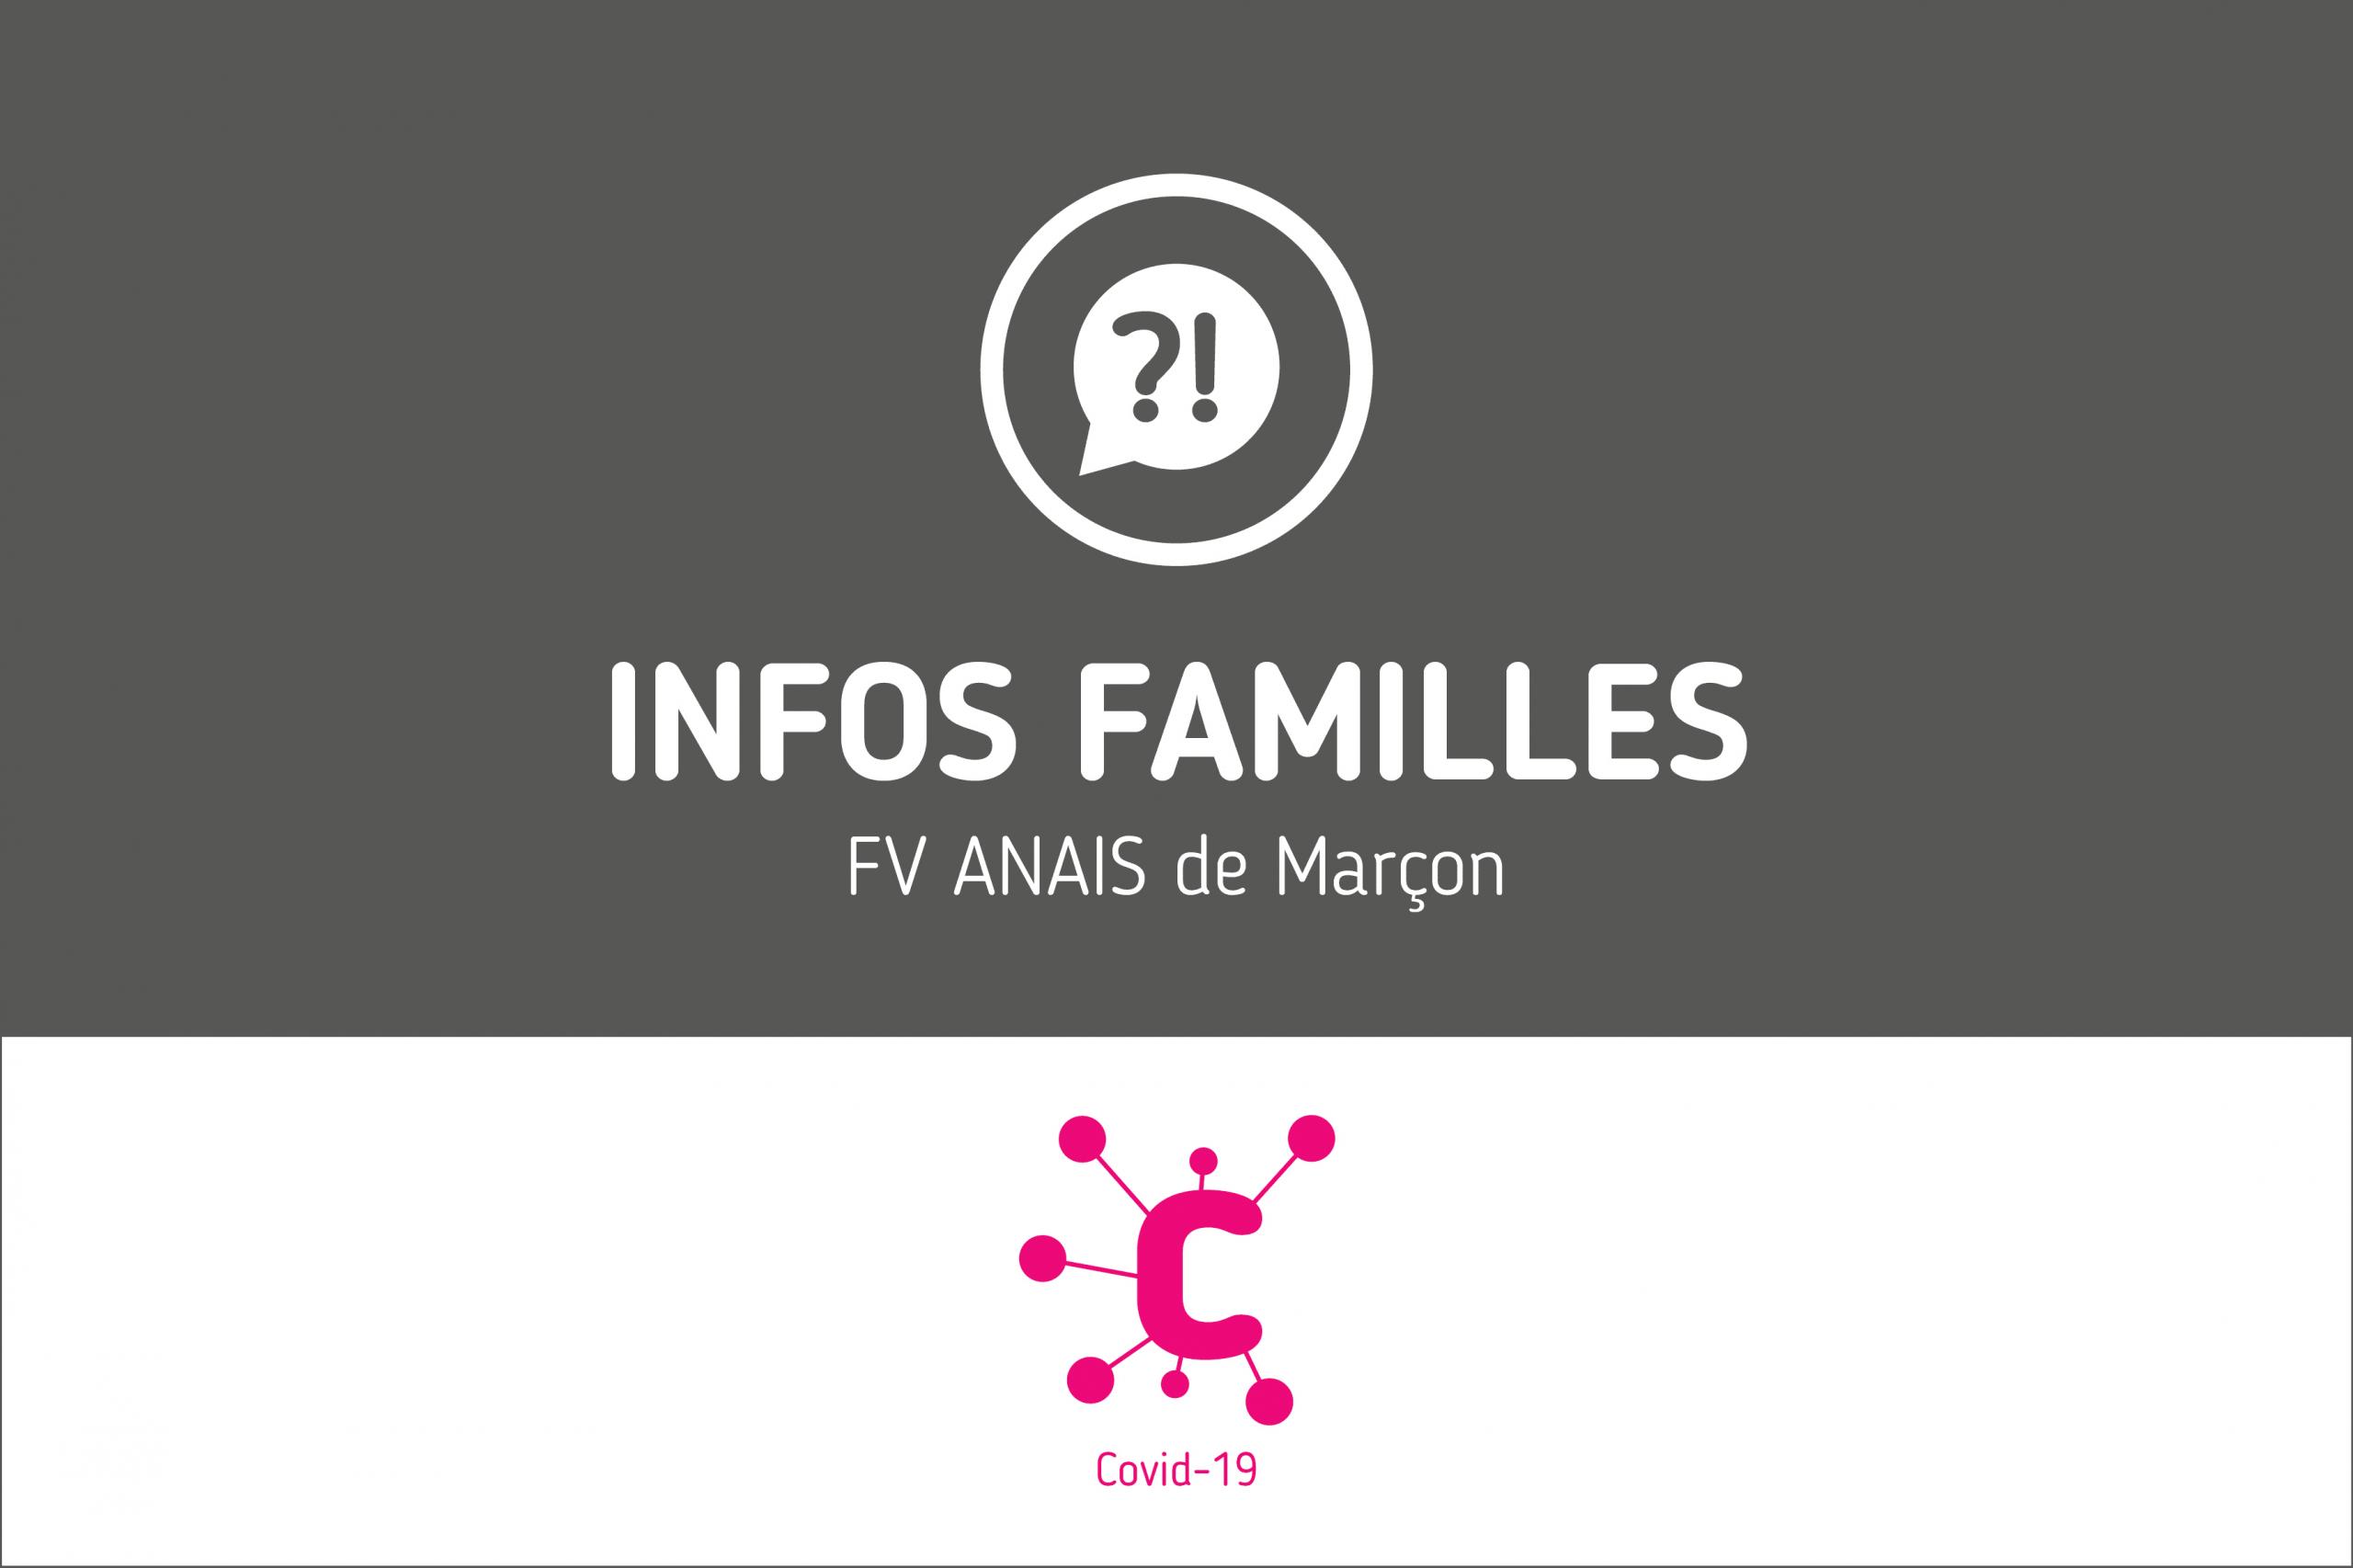 Protégé: Infos Familles – FV ANAIS de Marçon